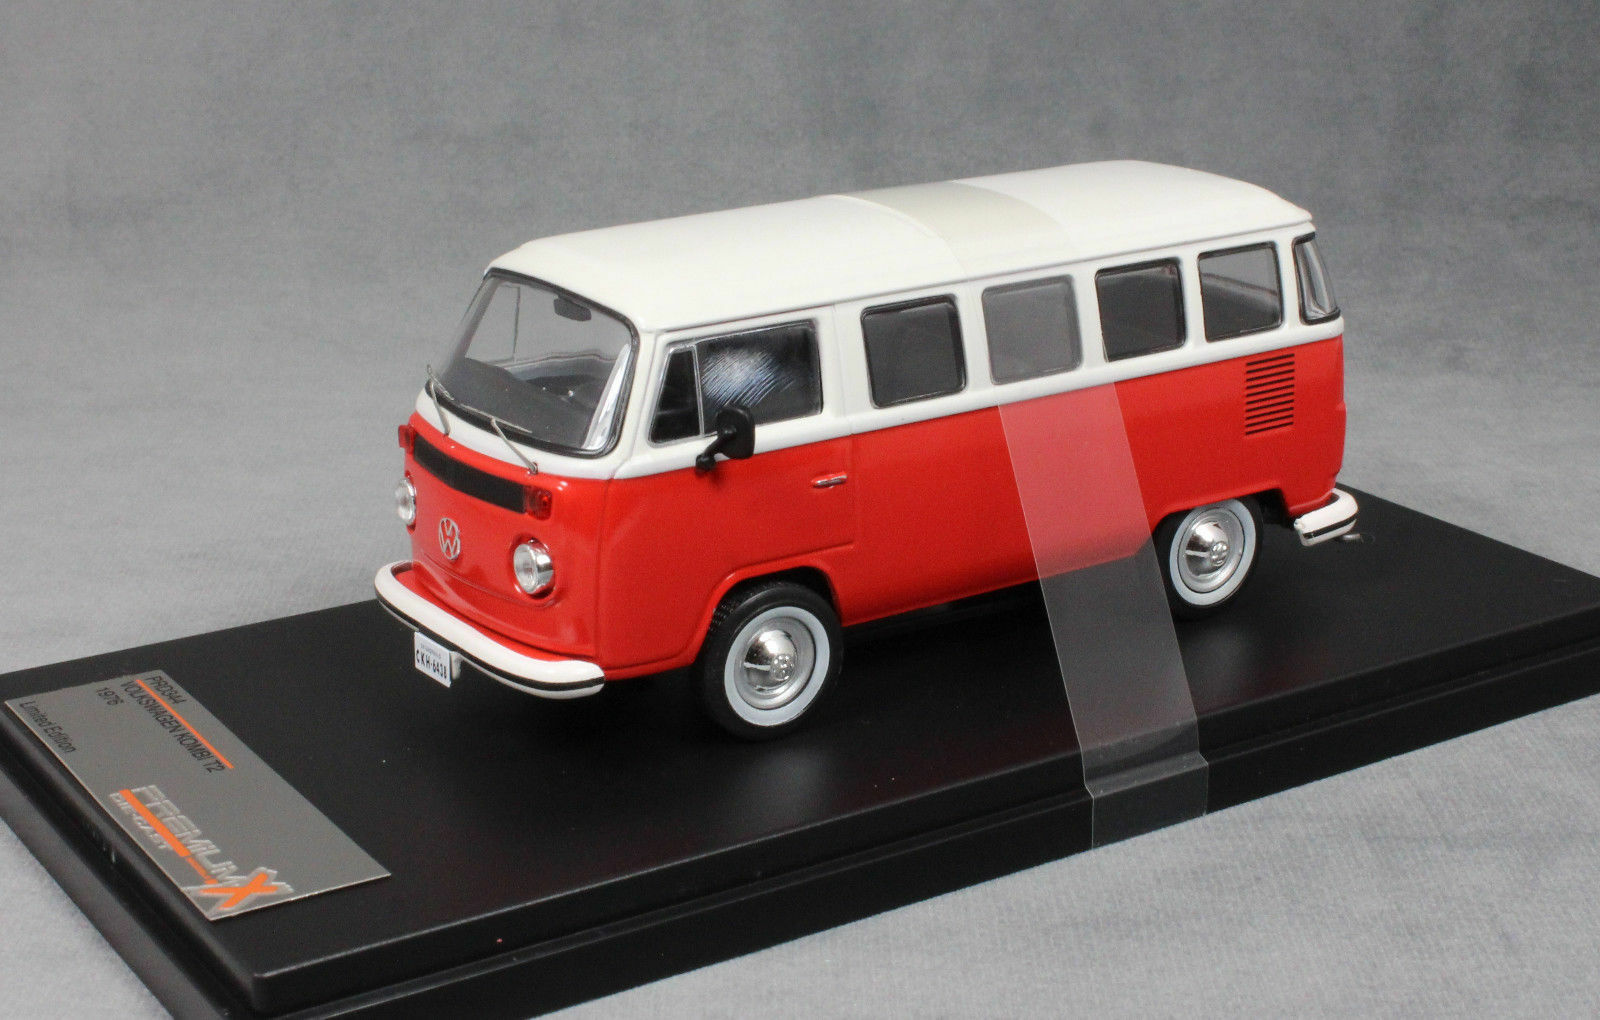 VW T2 KOMBI 1976 VITRE rouge PREMIUM X PRD344 1 43 VOLKSWAGEN TYPE 2 BULLI